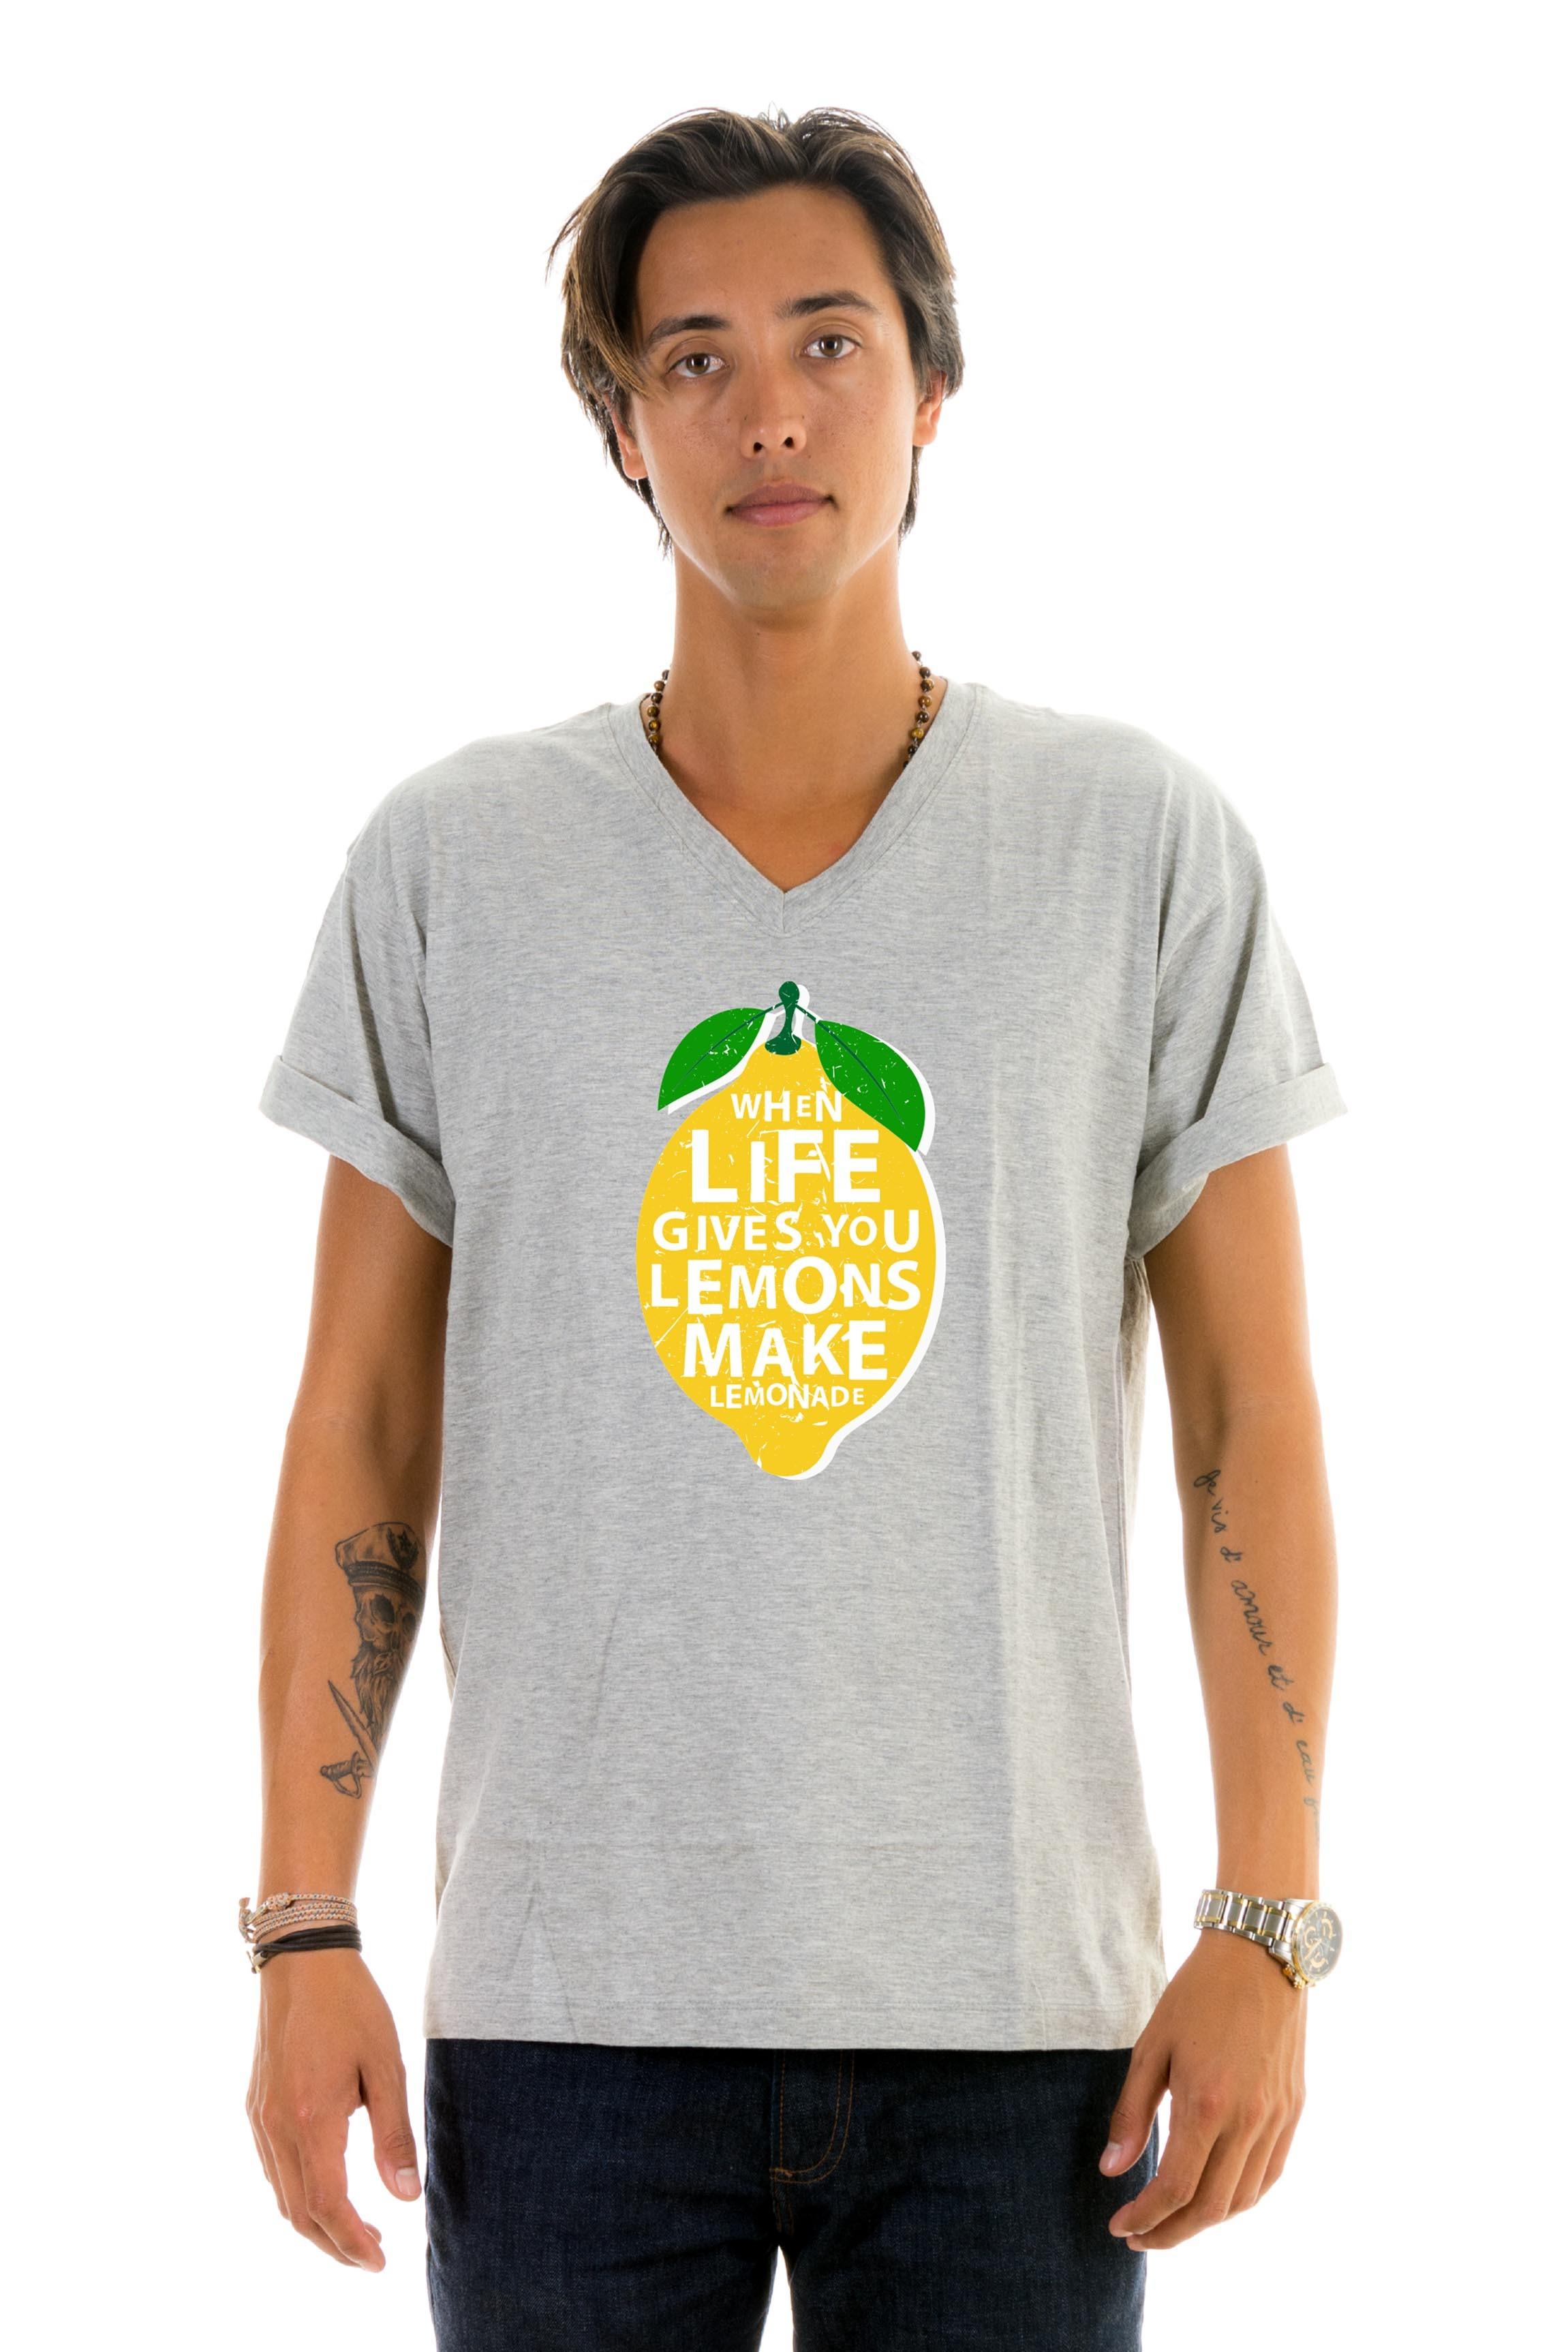 94367278f566 T-shirt v-neck Lemon Lemonade - T-shirts - Shop